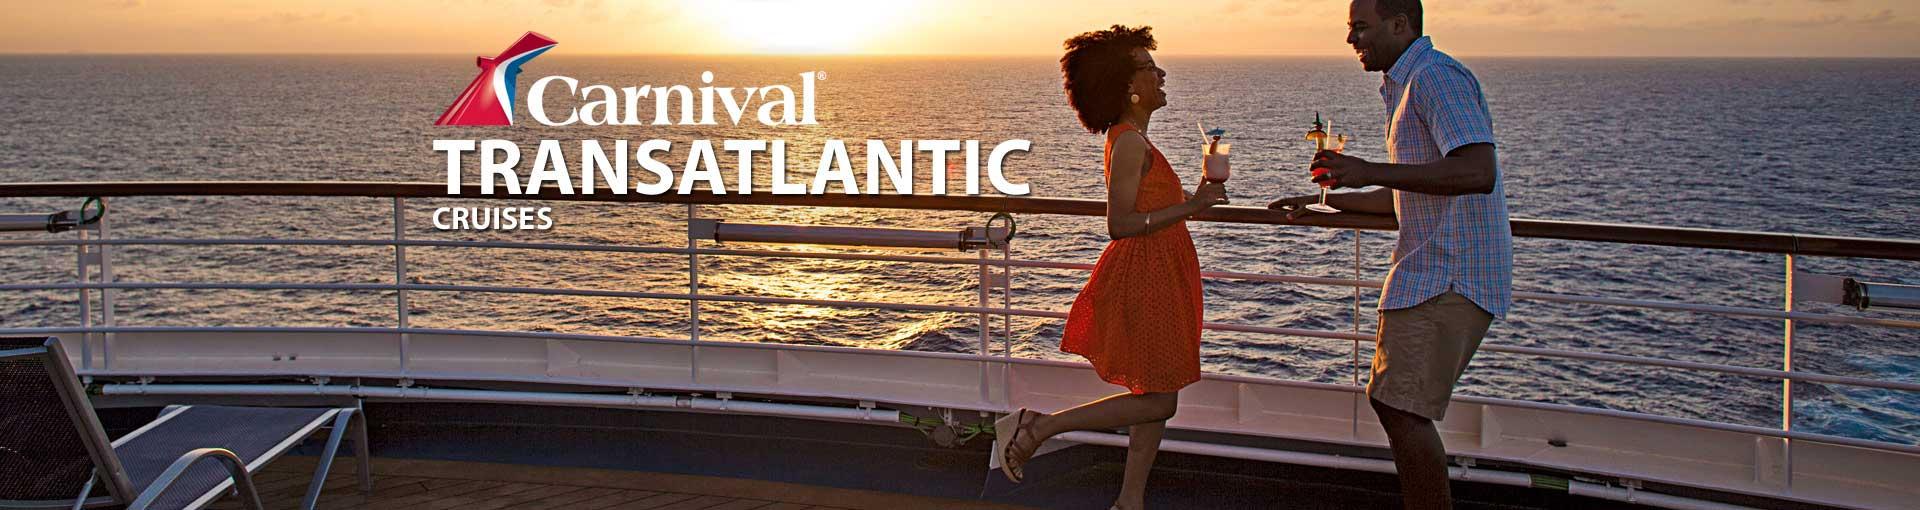 Carnival Cruise Lines Transatlantic Cruises